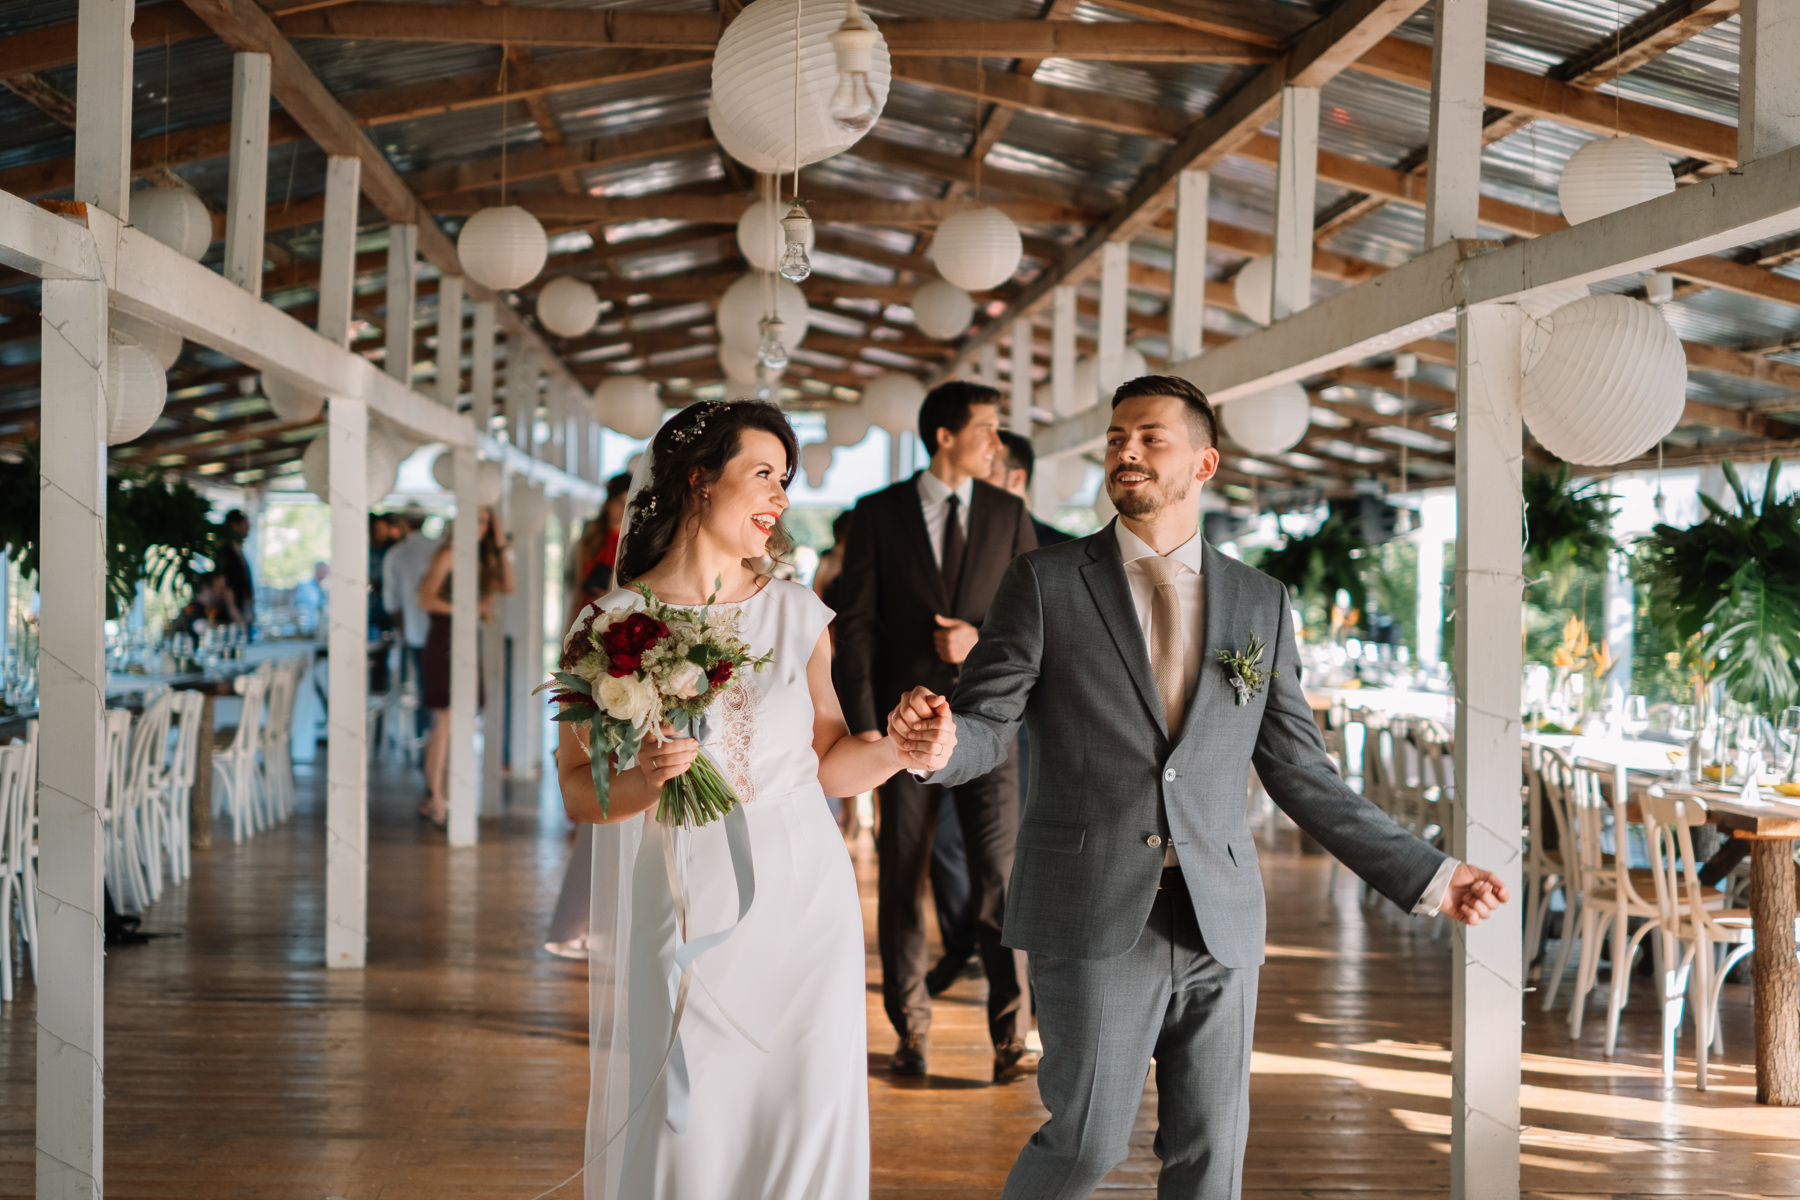 wedding deersphotography0033